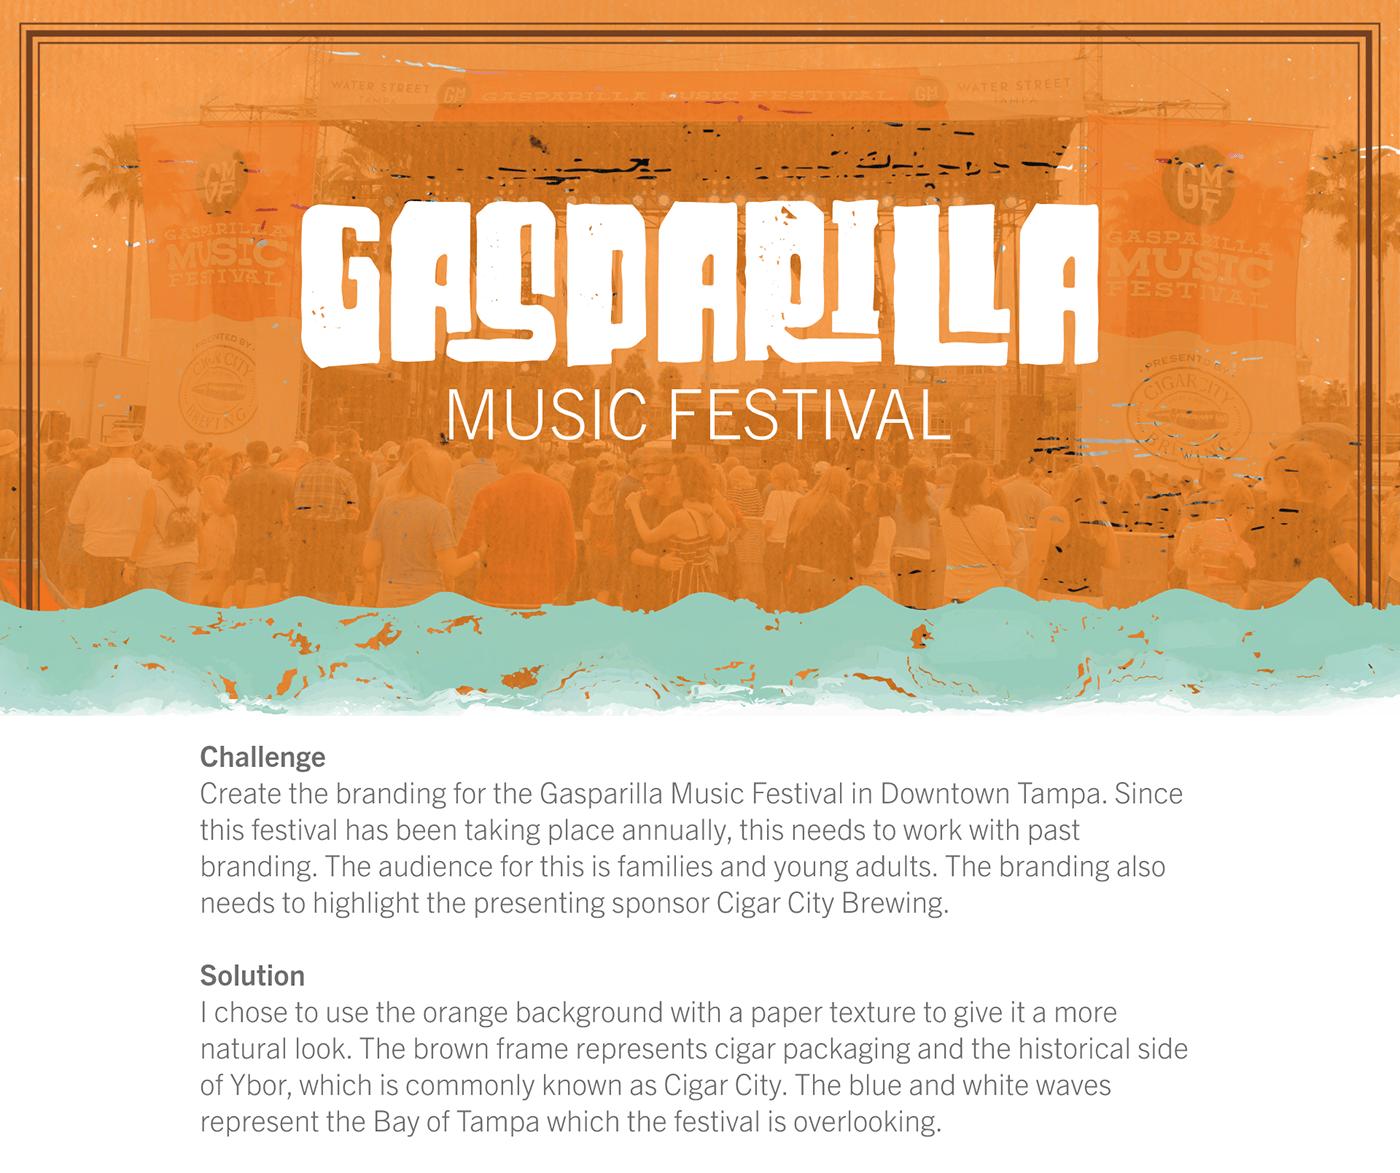 branding  festival florida gasparilla music Ocean pirate tampa adobeofficehours adobeawards